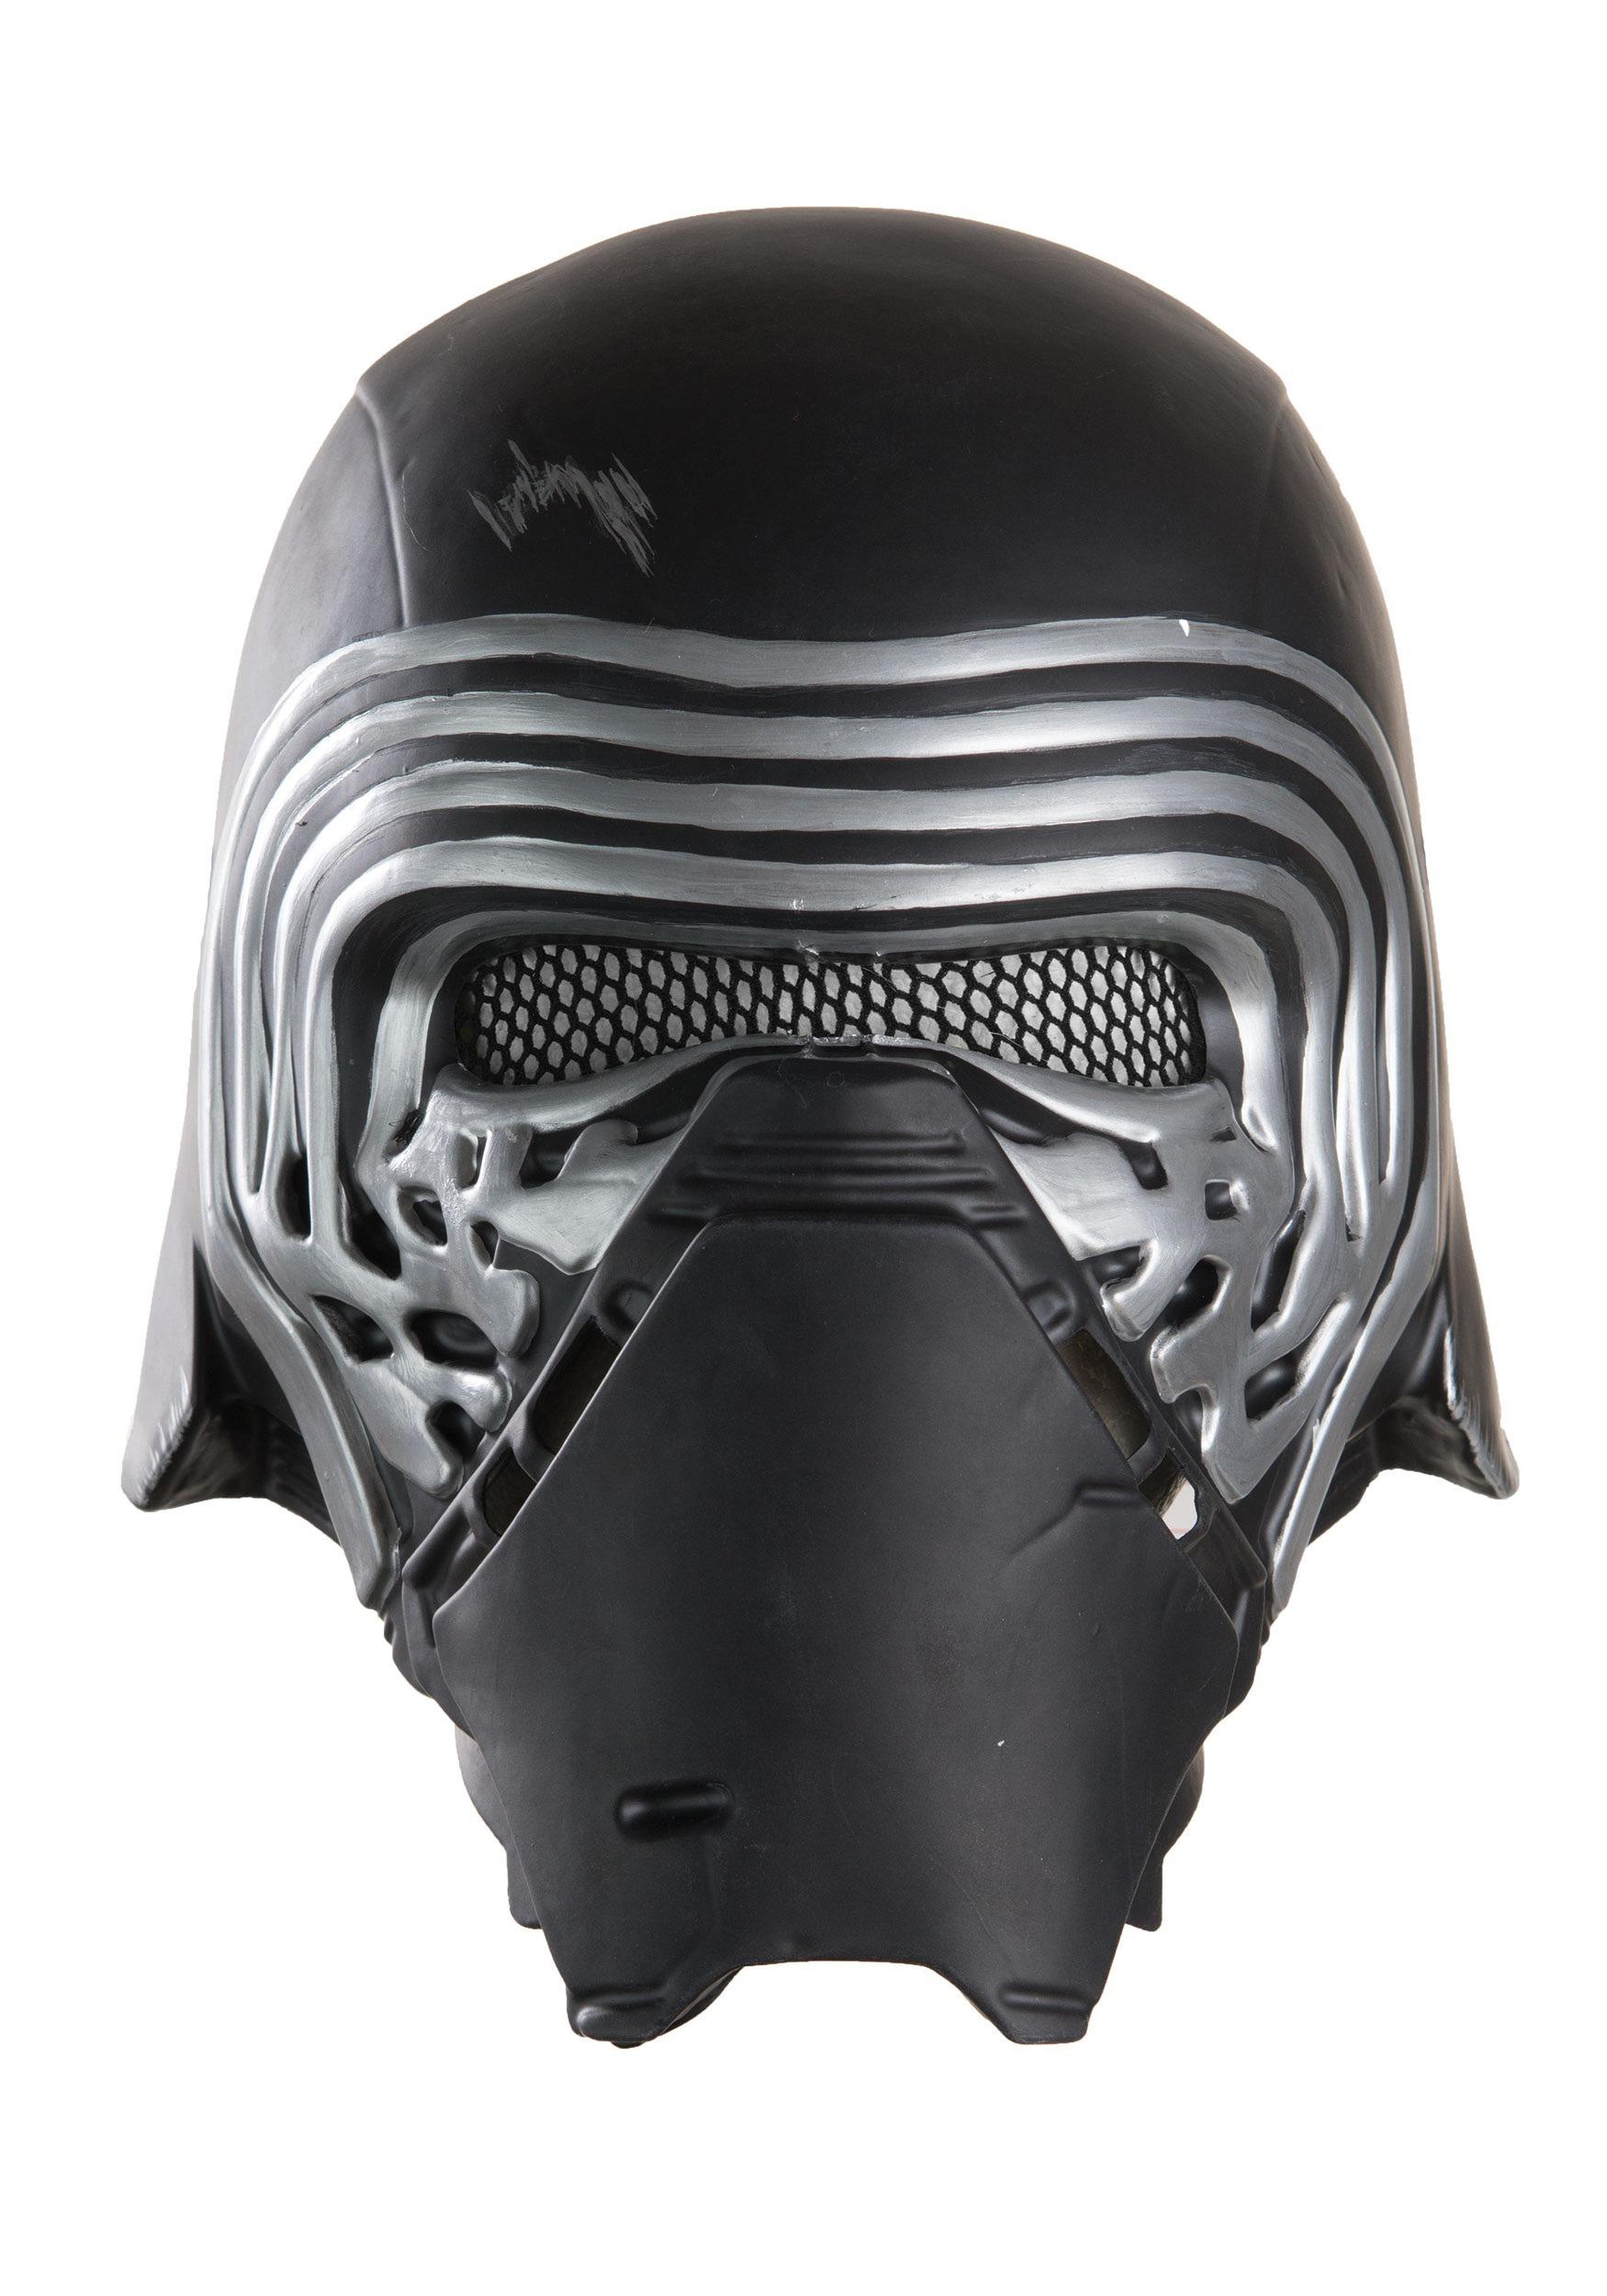 Child Star Wars The Force Awakens Kylo Ren 1/2 Helmet RU32263